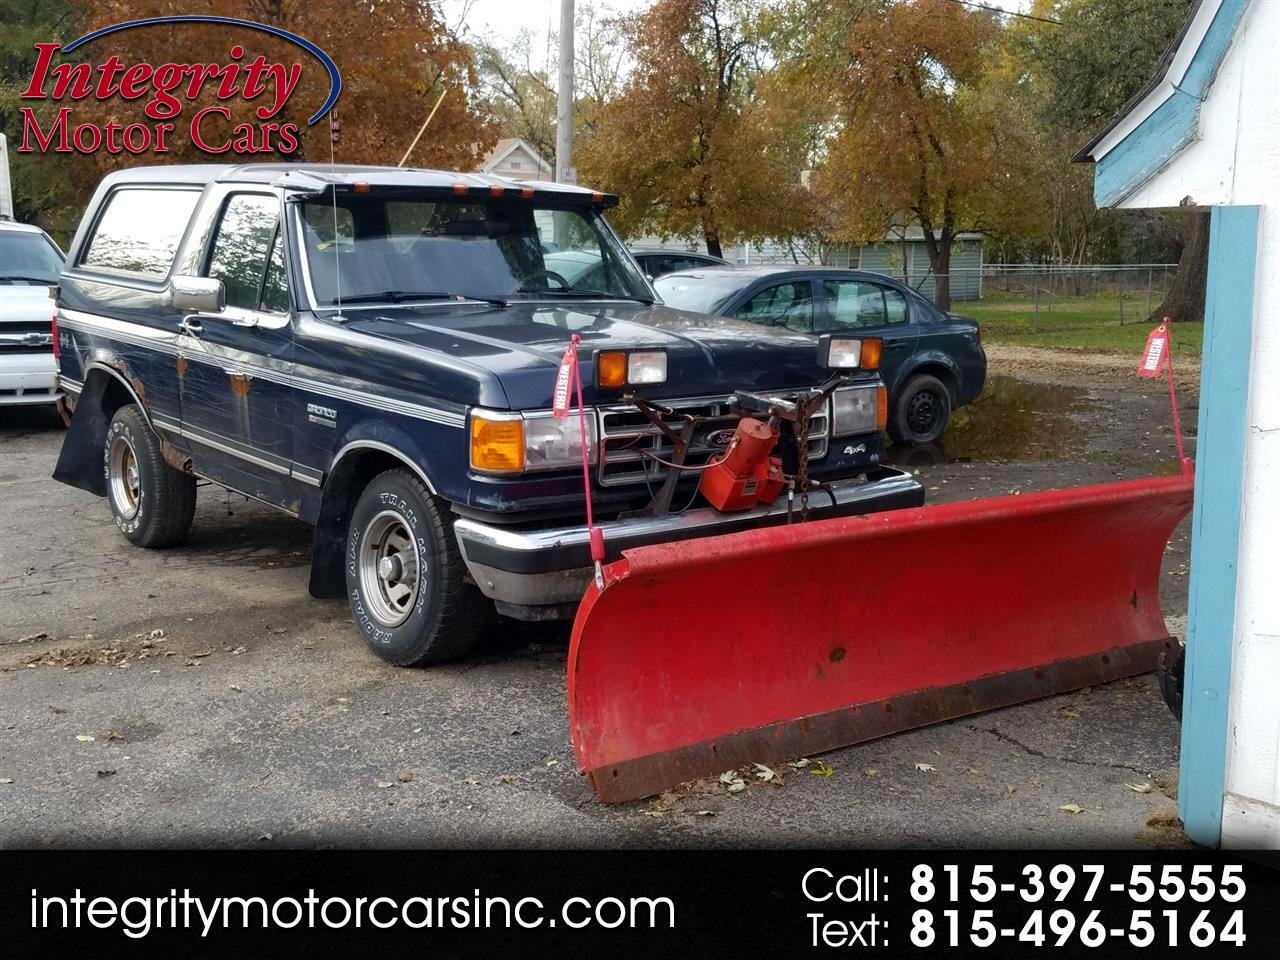 Ford Bronco 1988 for Sale in Rockford, IL